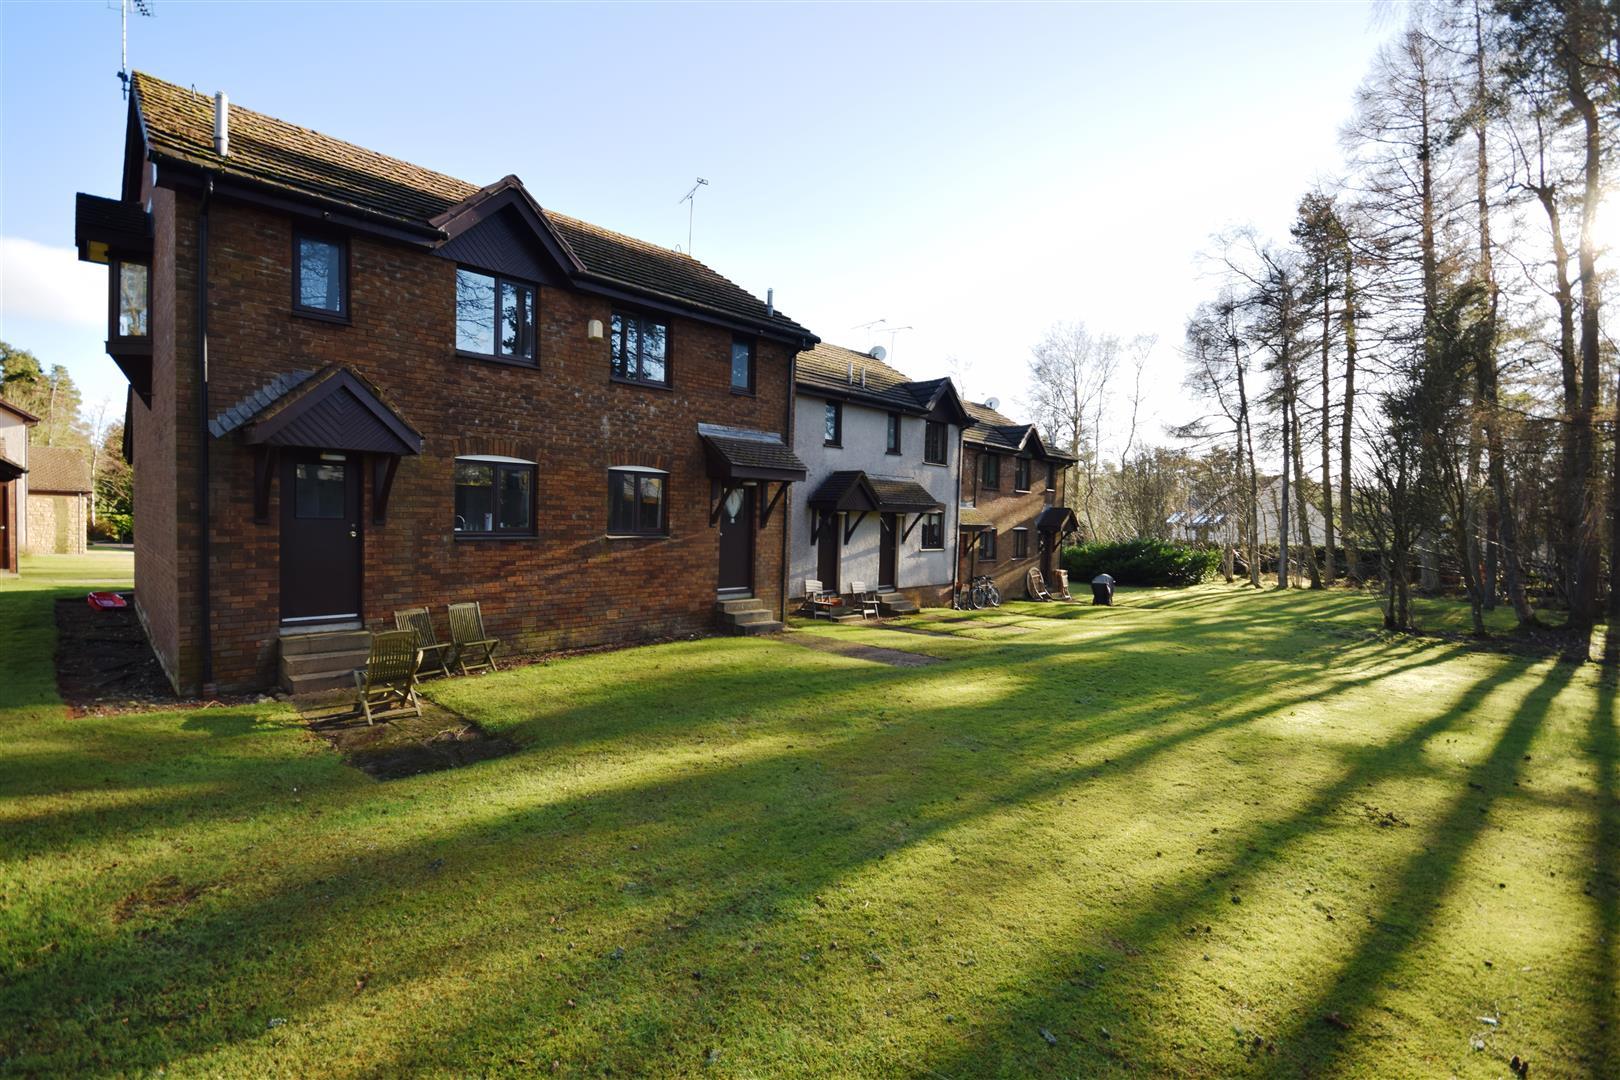 30, Dunbar Court, Gleneagles Village, Gleneagles, Auchterarder, Perthshire, PH3 1SE, UK